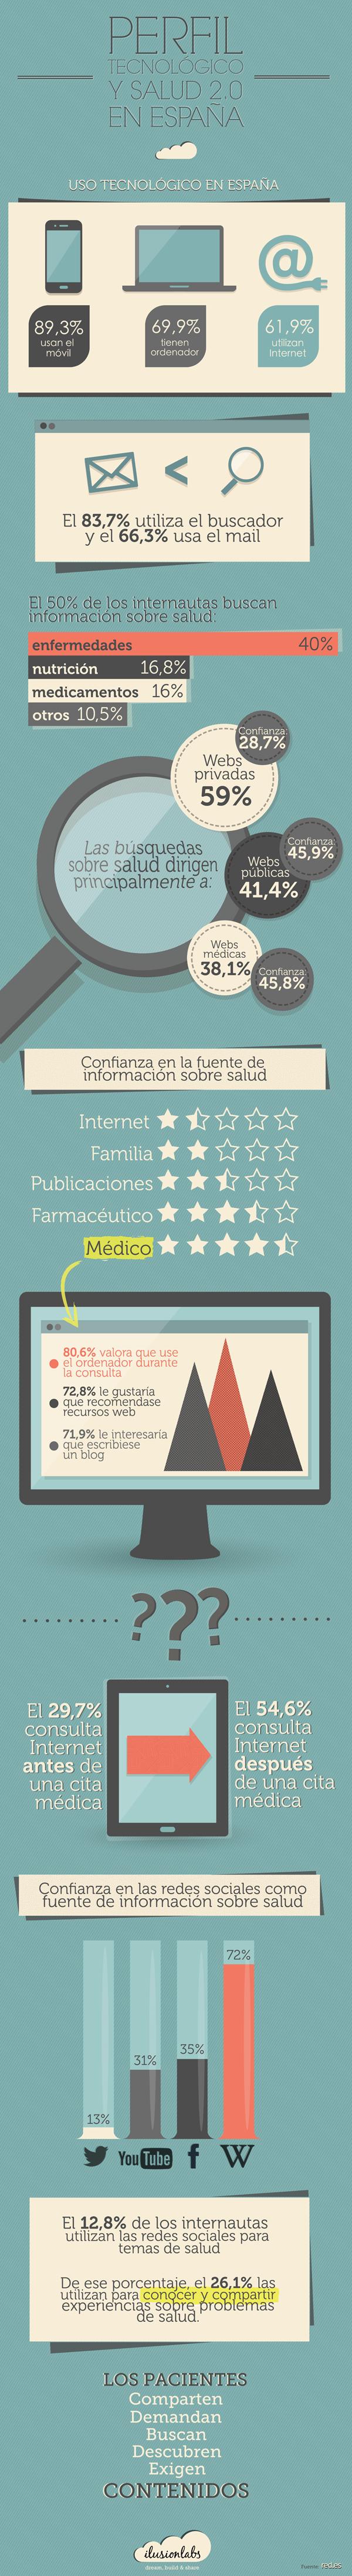 Perfil tecnológico salud 2.0 España